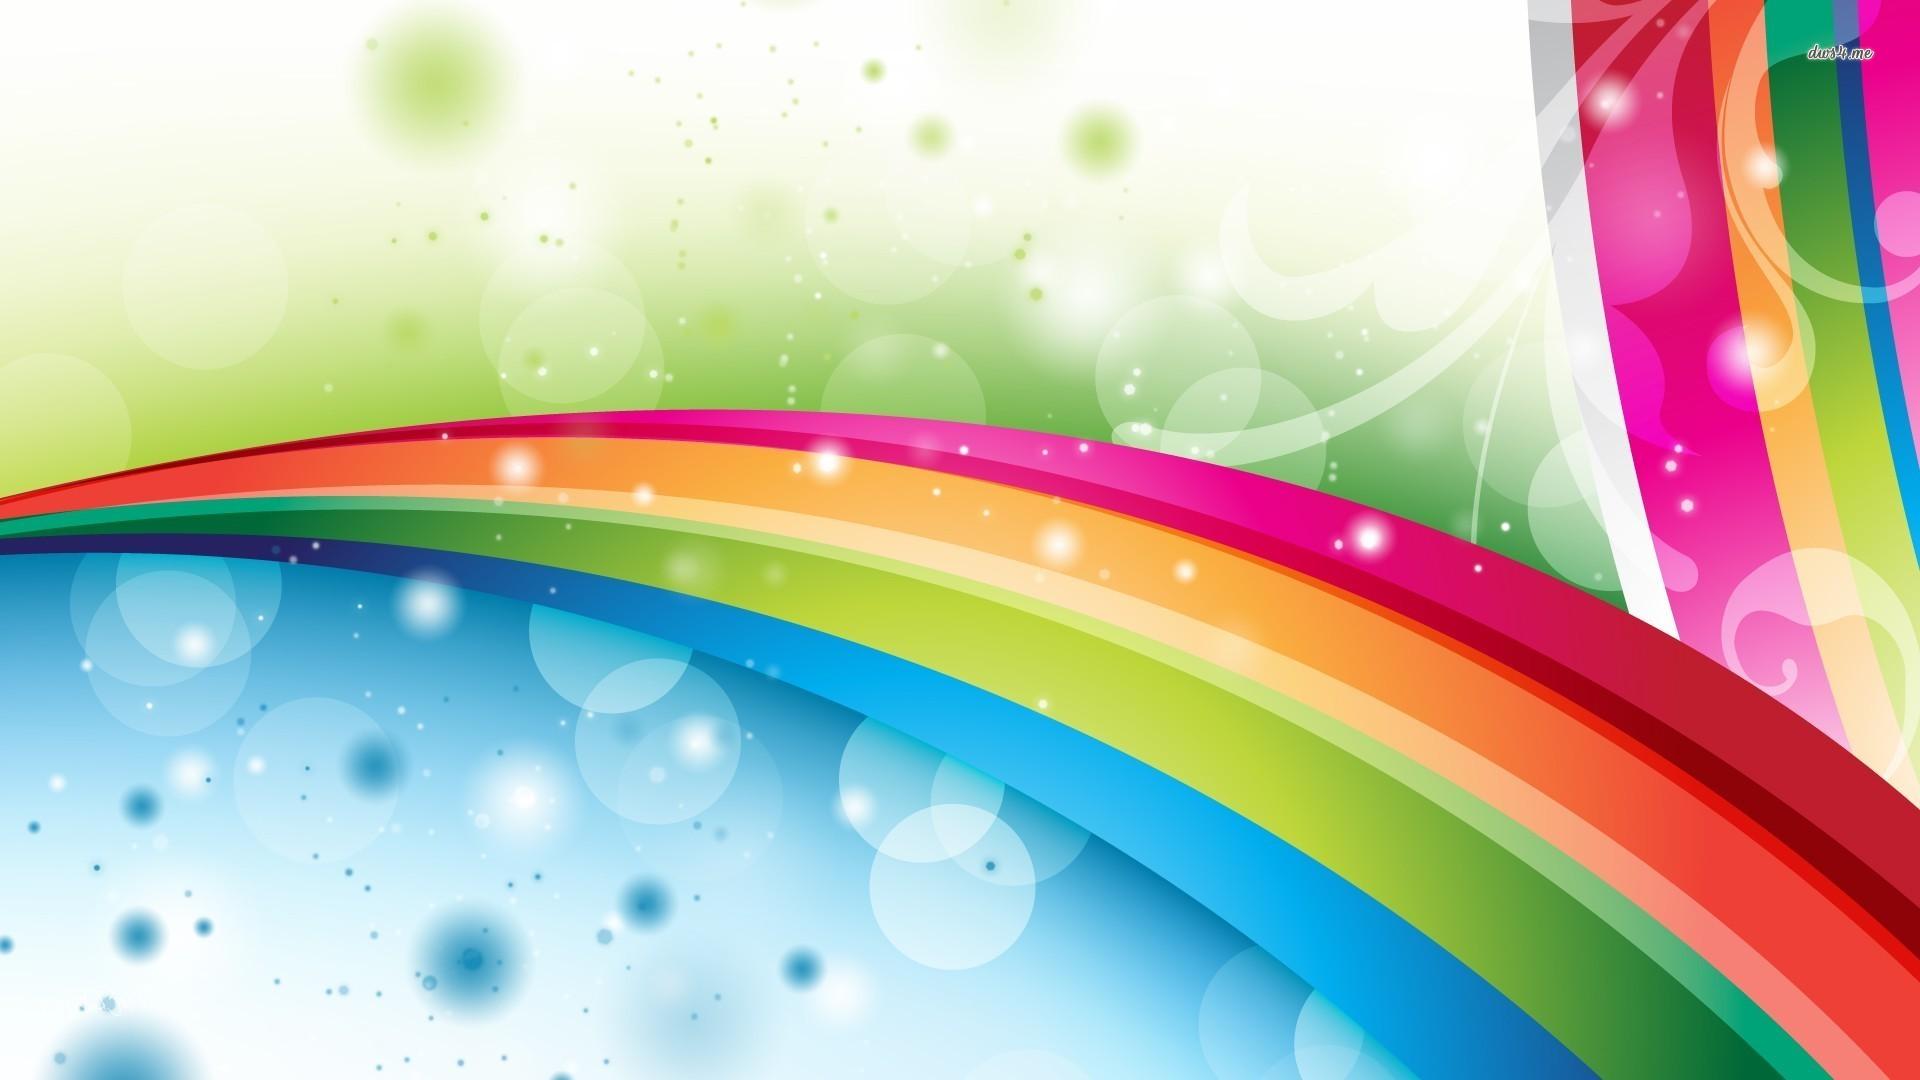 Rainbow Colors Hd Desktop Wallpaper High Definition Fullscreen 1920x1080